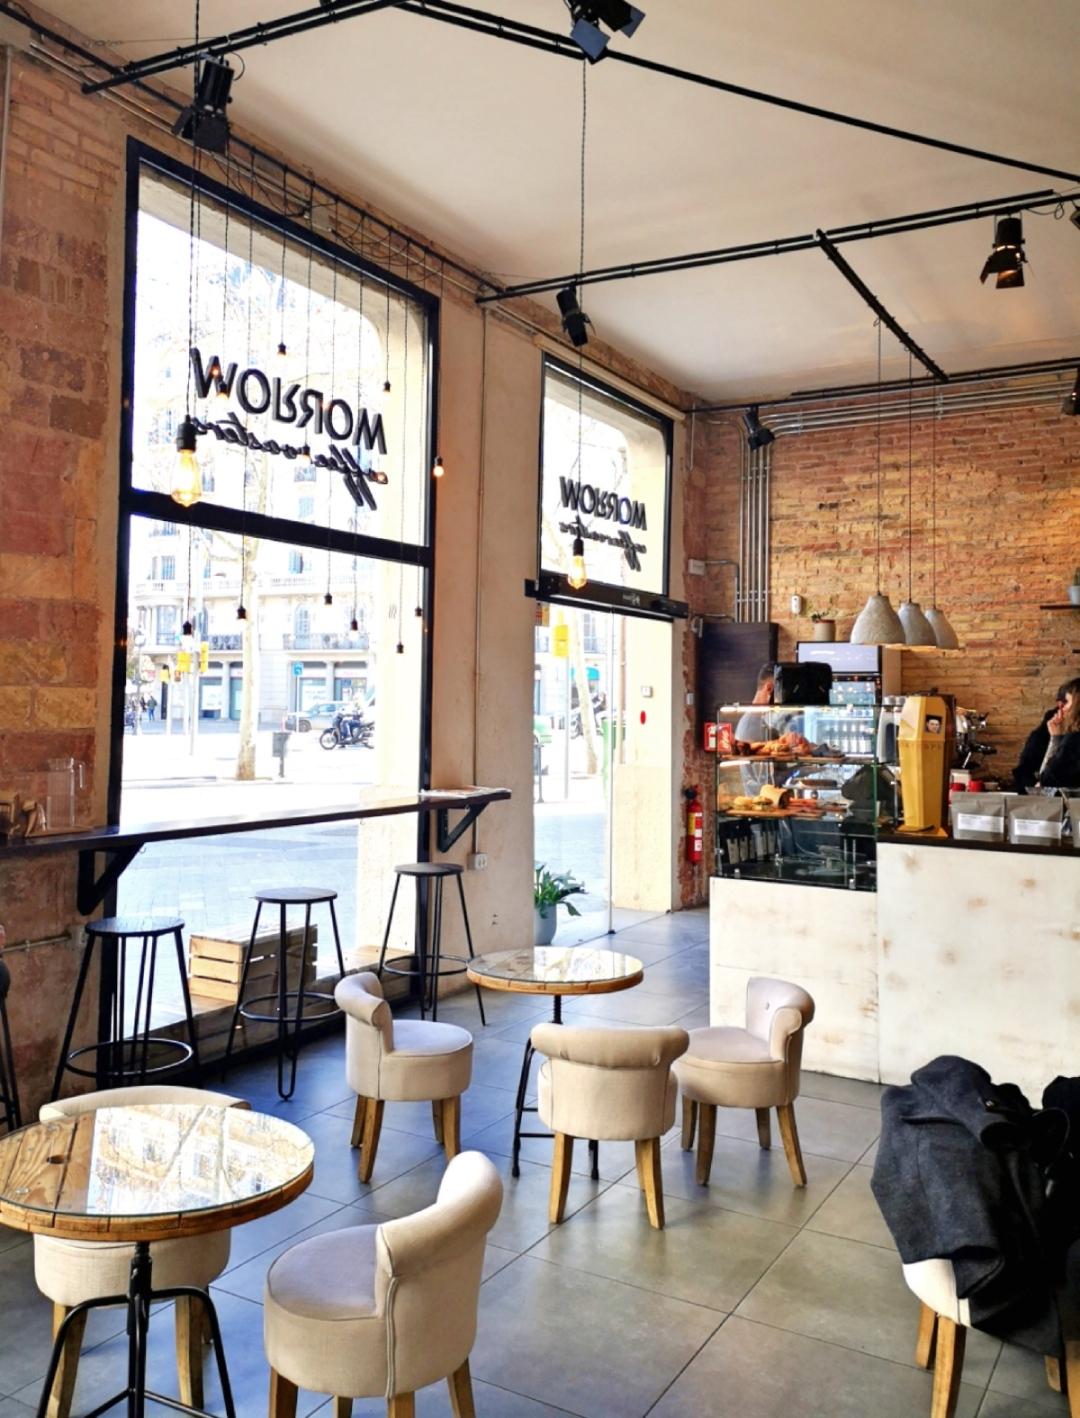 Best third wave coffee Barcelona